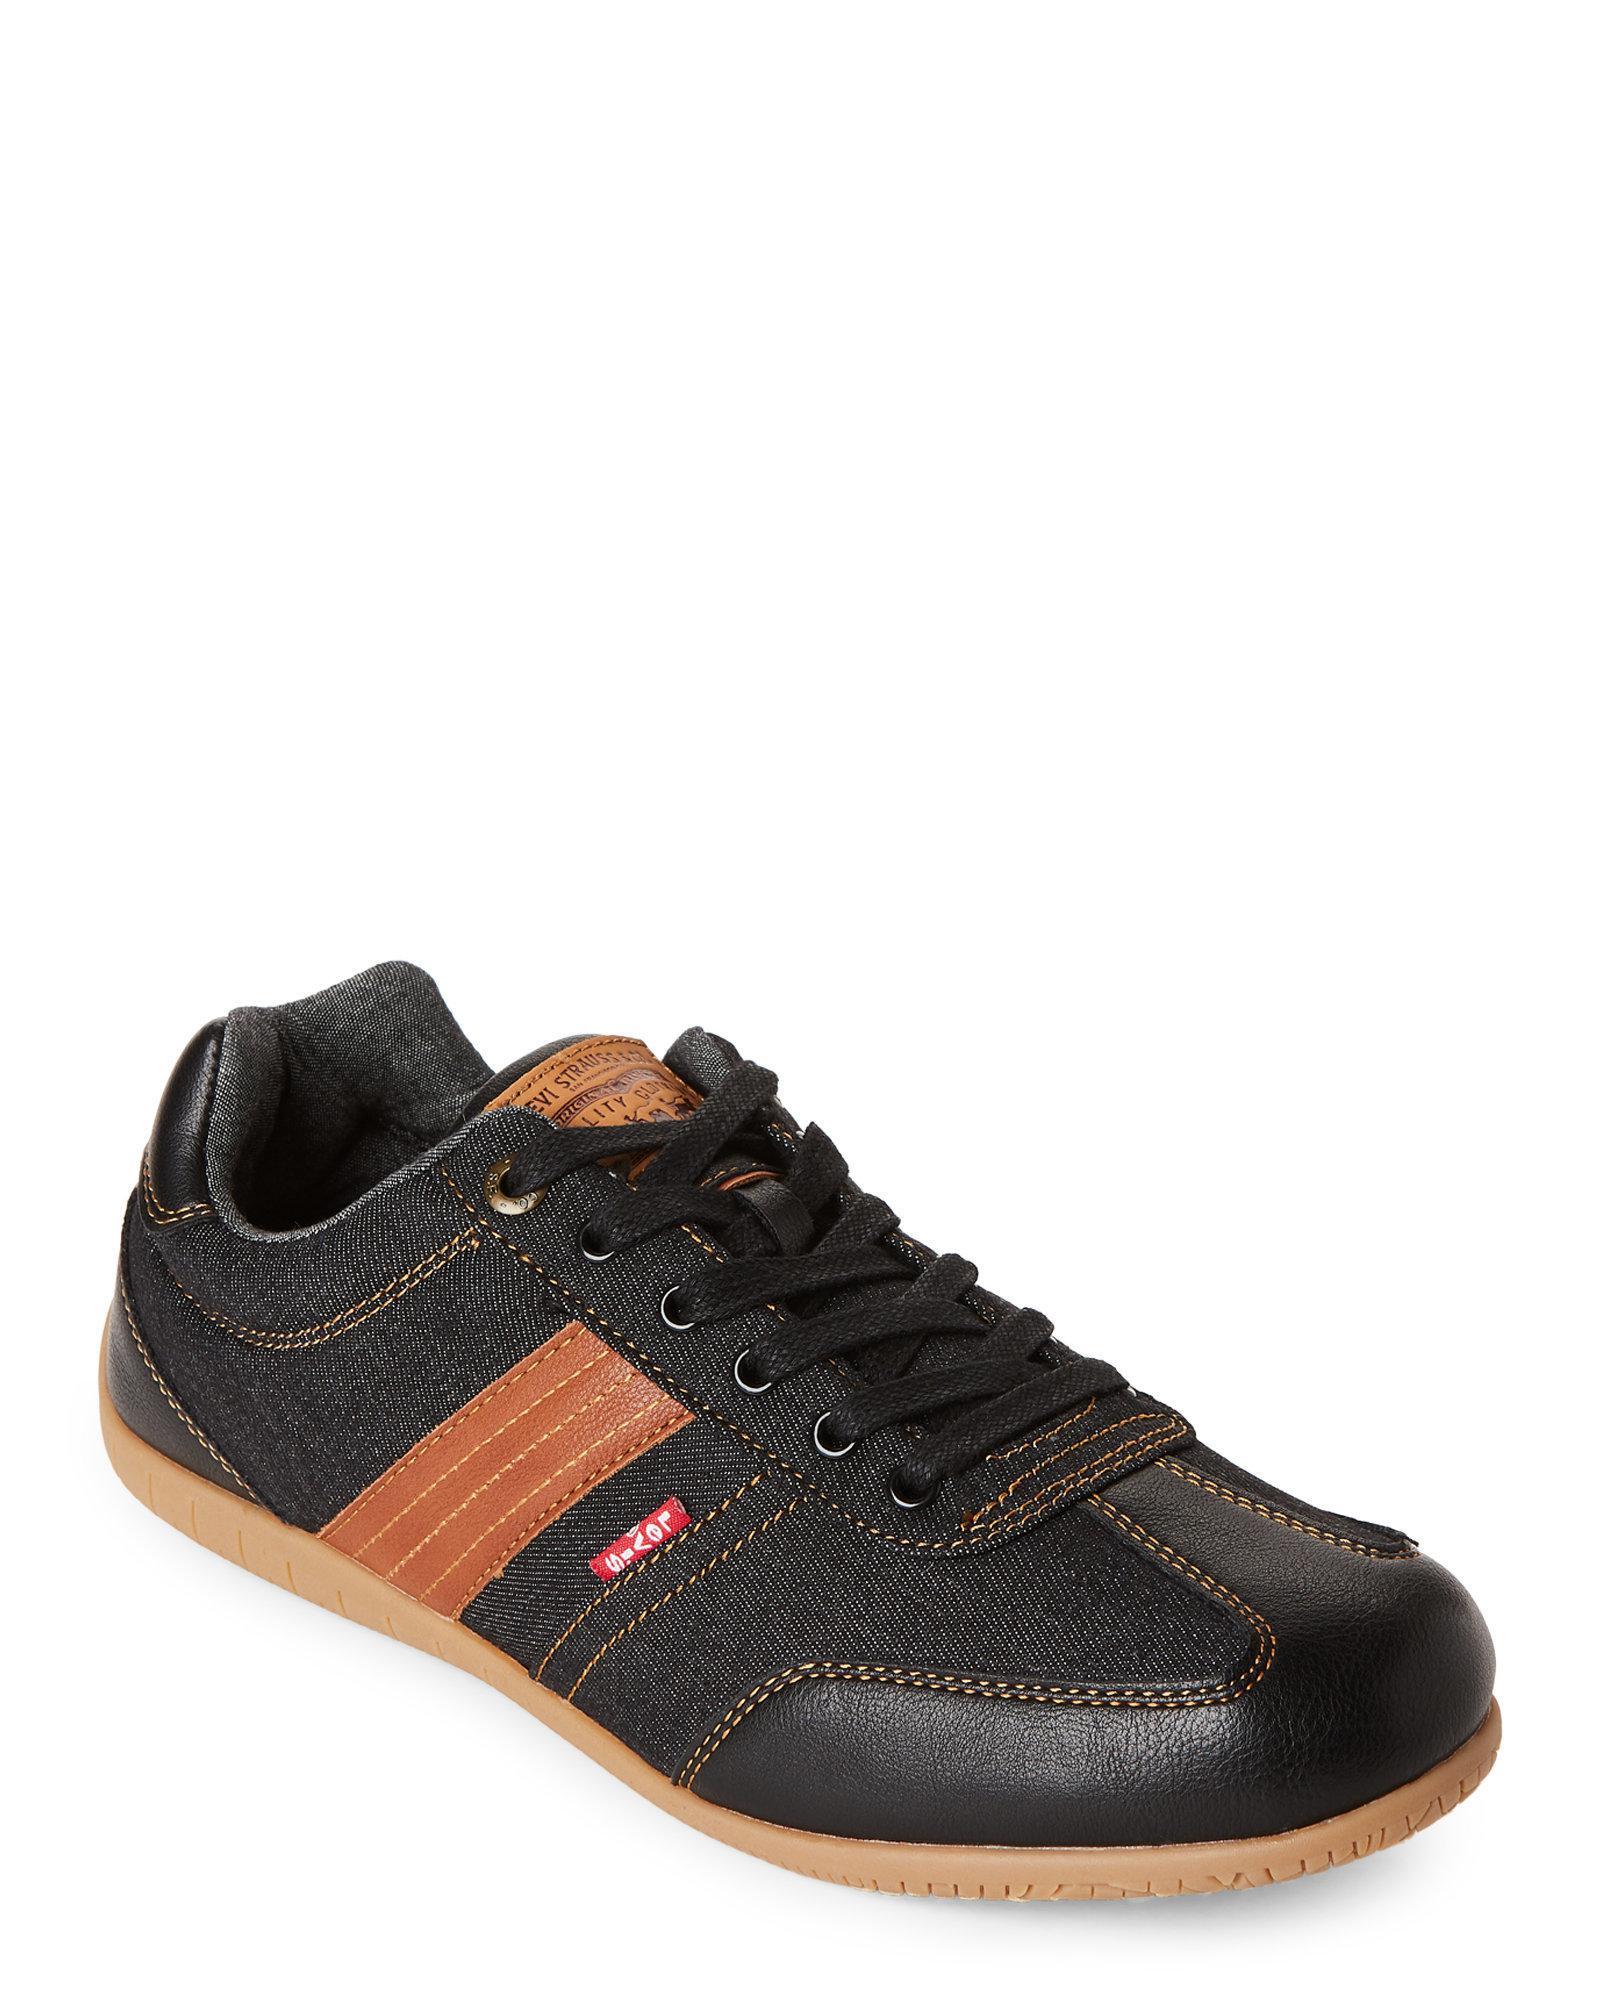 Levi's. Men's Black & Tan Solano Nappa Denim Low-top Sneakers